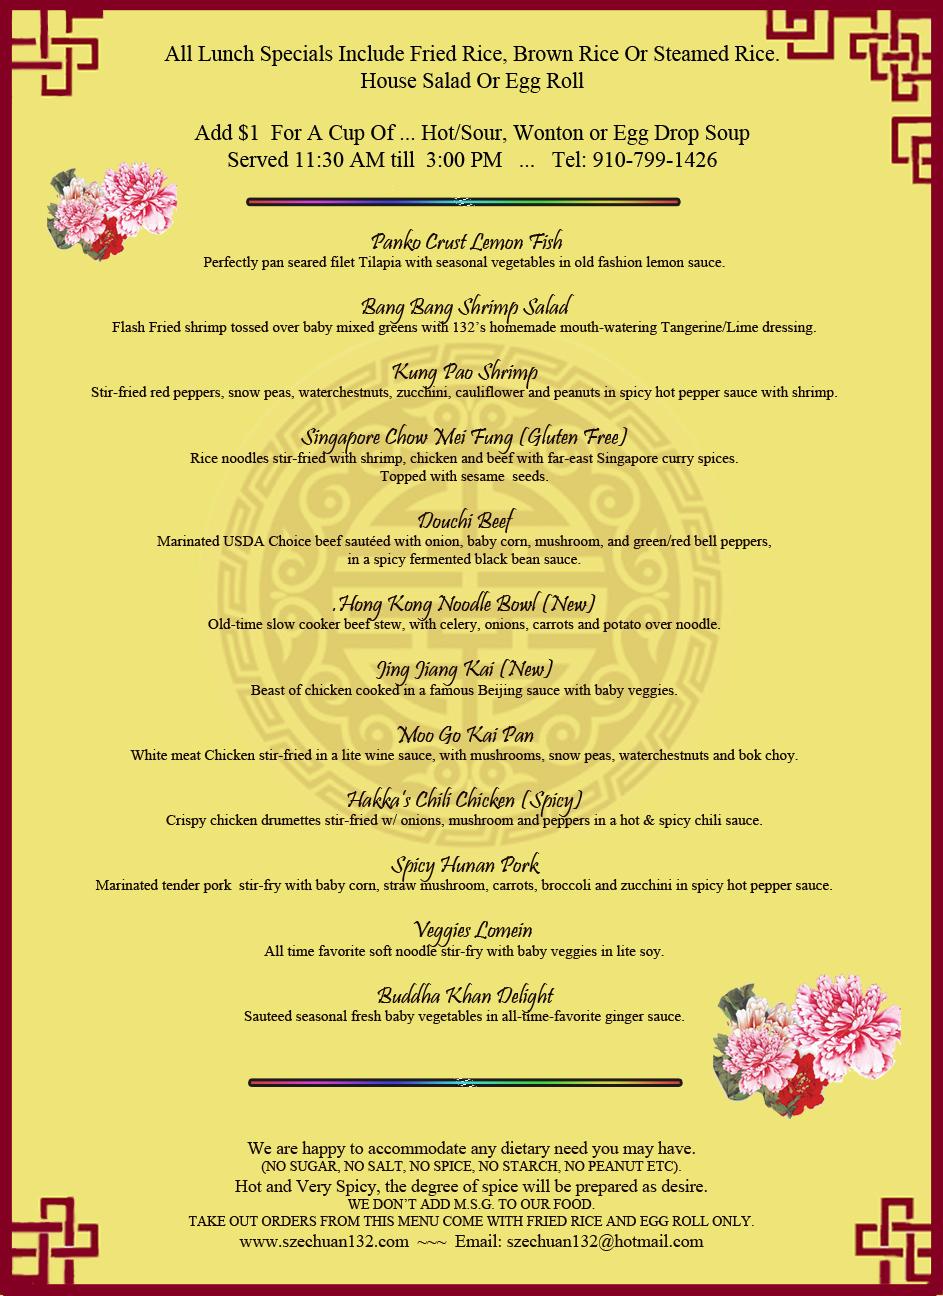 03-18-17 Lunch menu